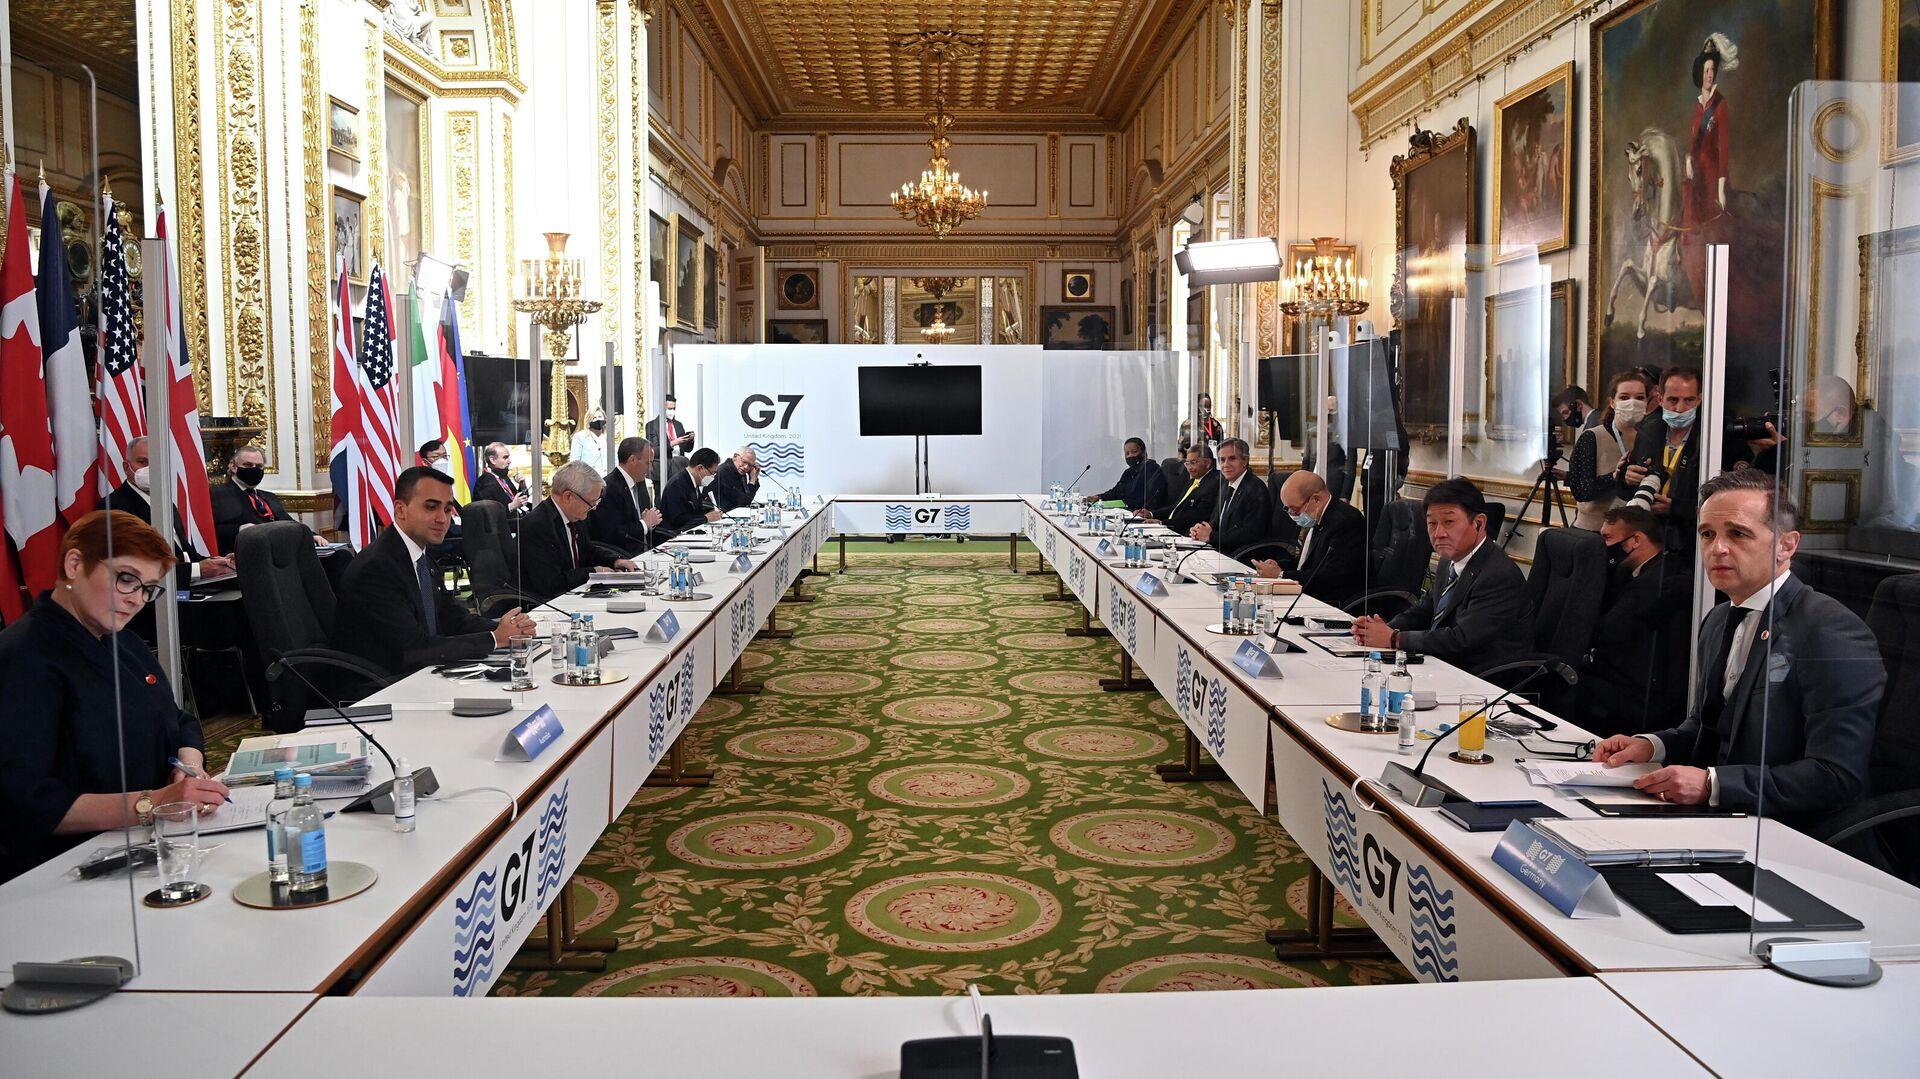 Reunión de G7 - Sputnik Mundo, 1920, 05.05.2021